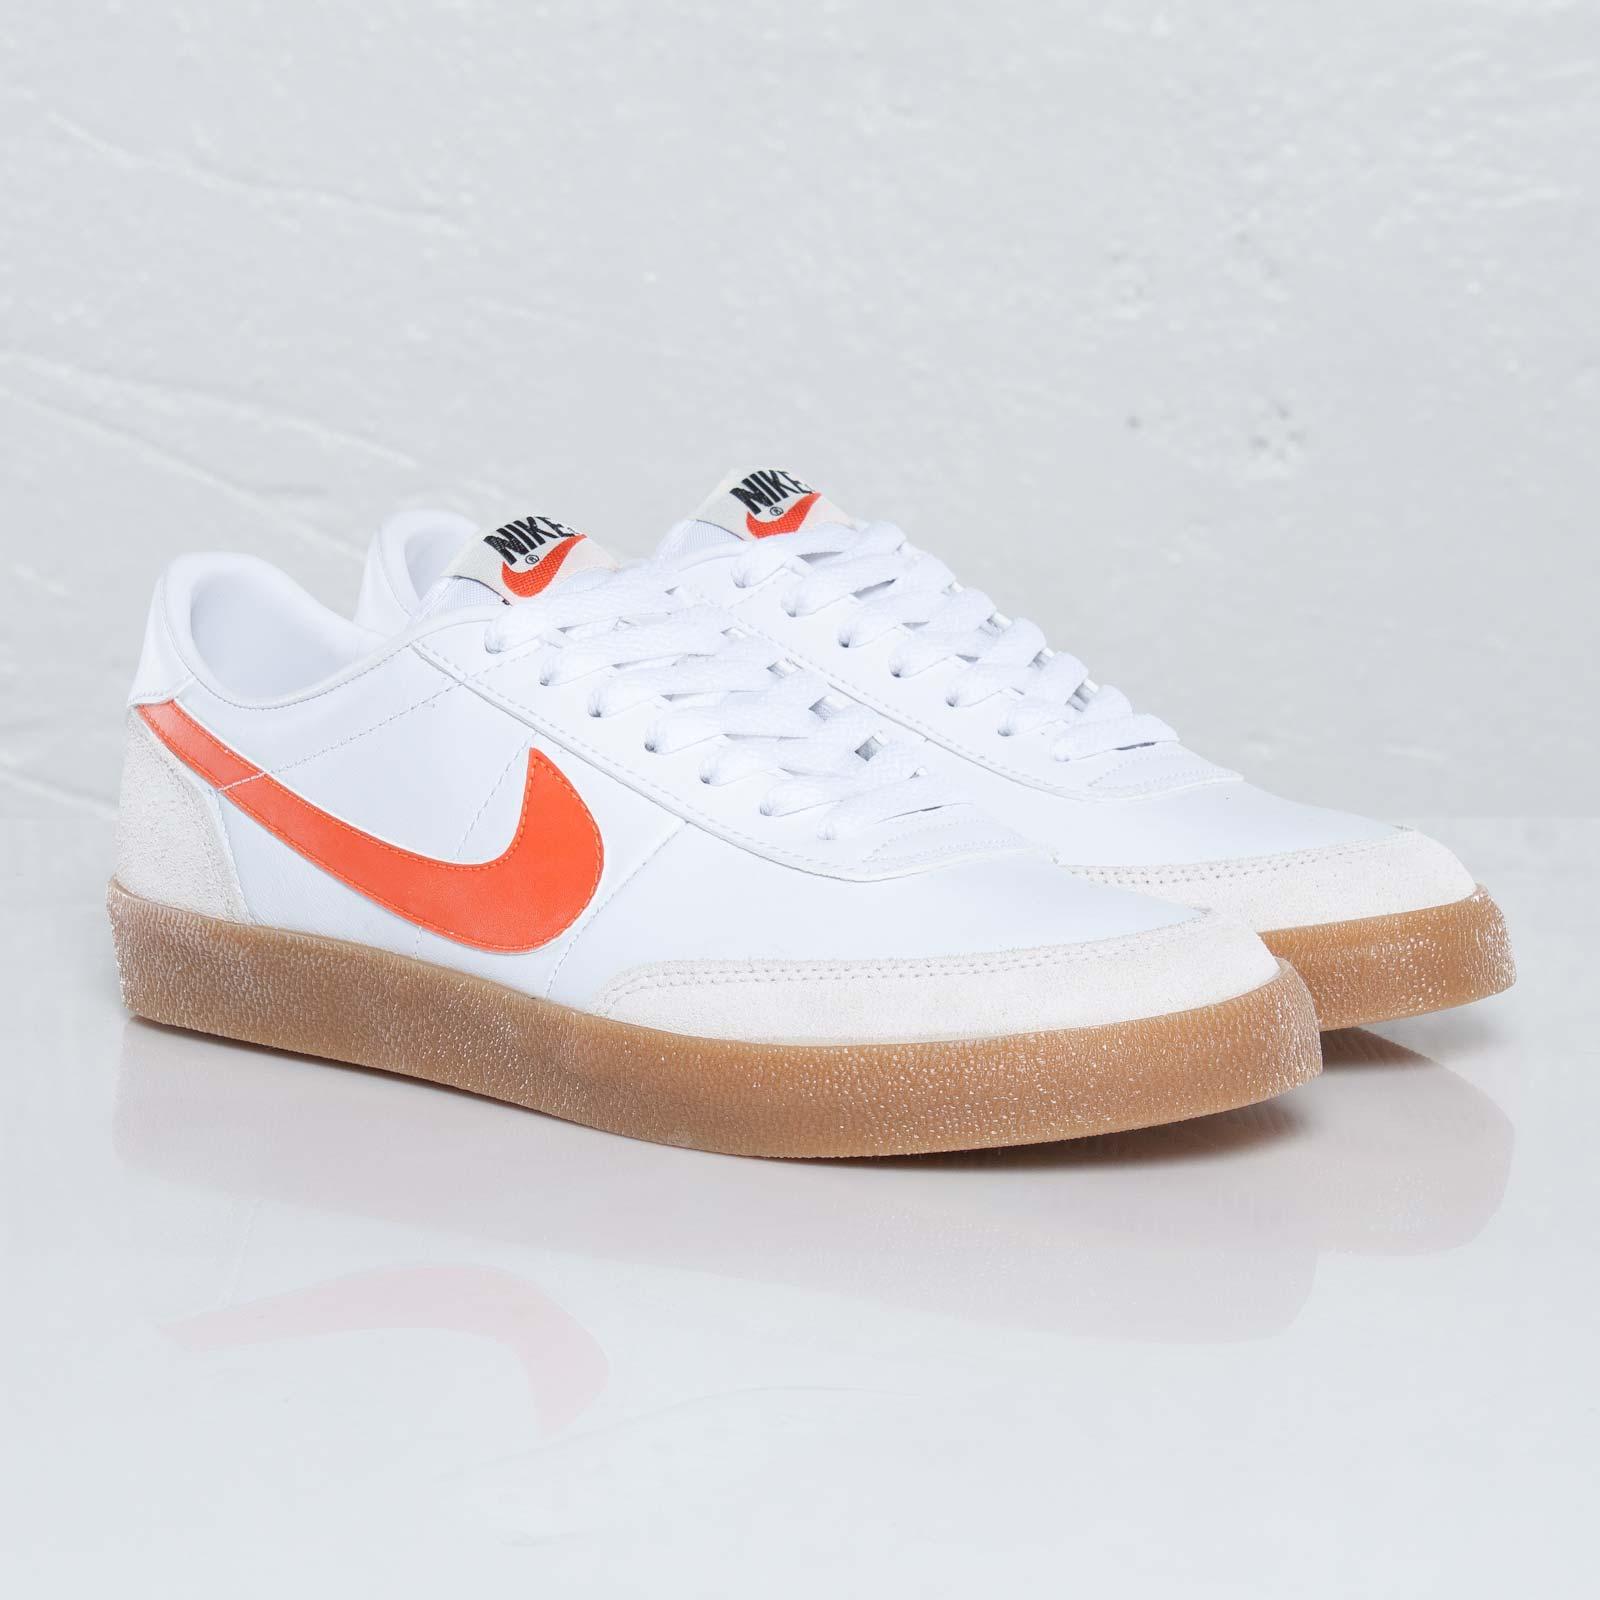 the latest 5f0e7 22697 Nike Killshot 2 Leather